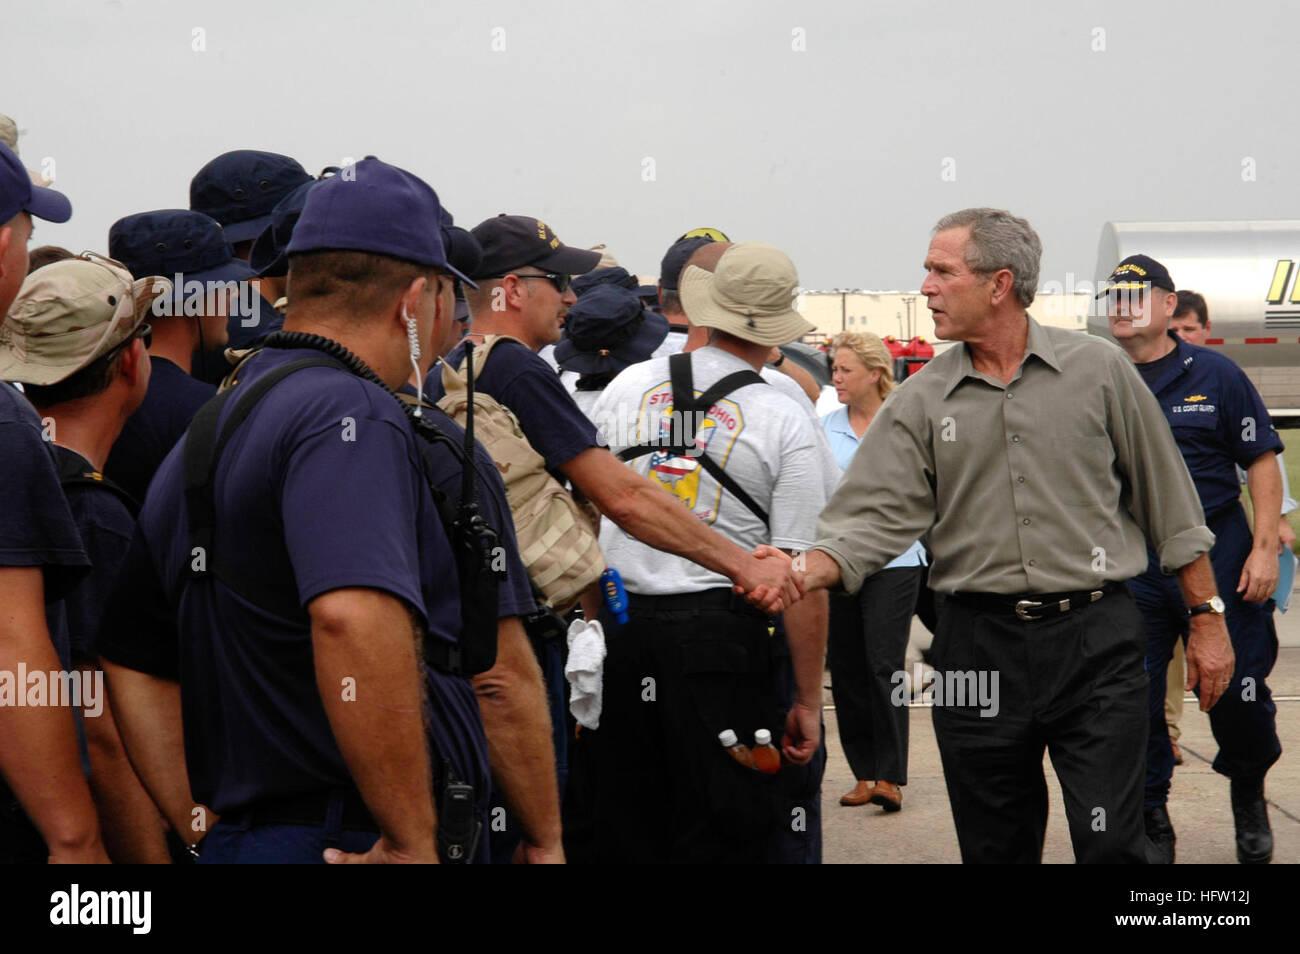 050927-G-0000O-001 Lake Charles, La. (Sept. 27, 2005) - President George W. Bush and U.S. Coast Guard Vice Adm. Stock Photo